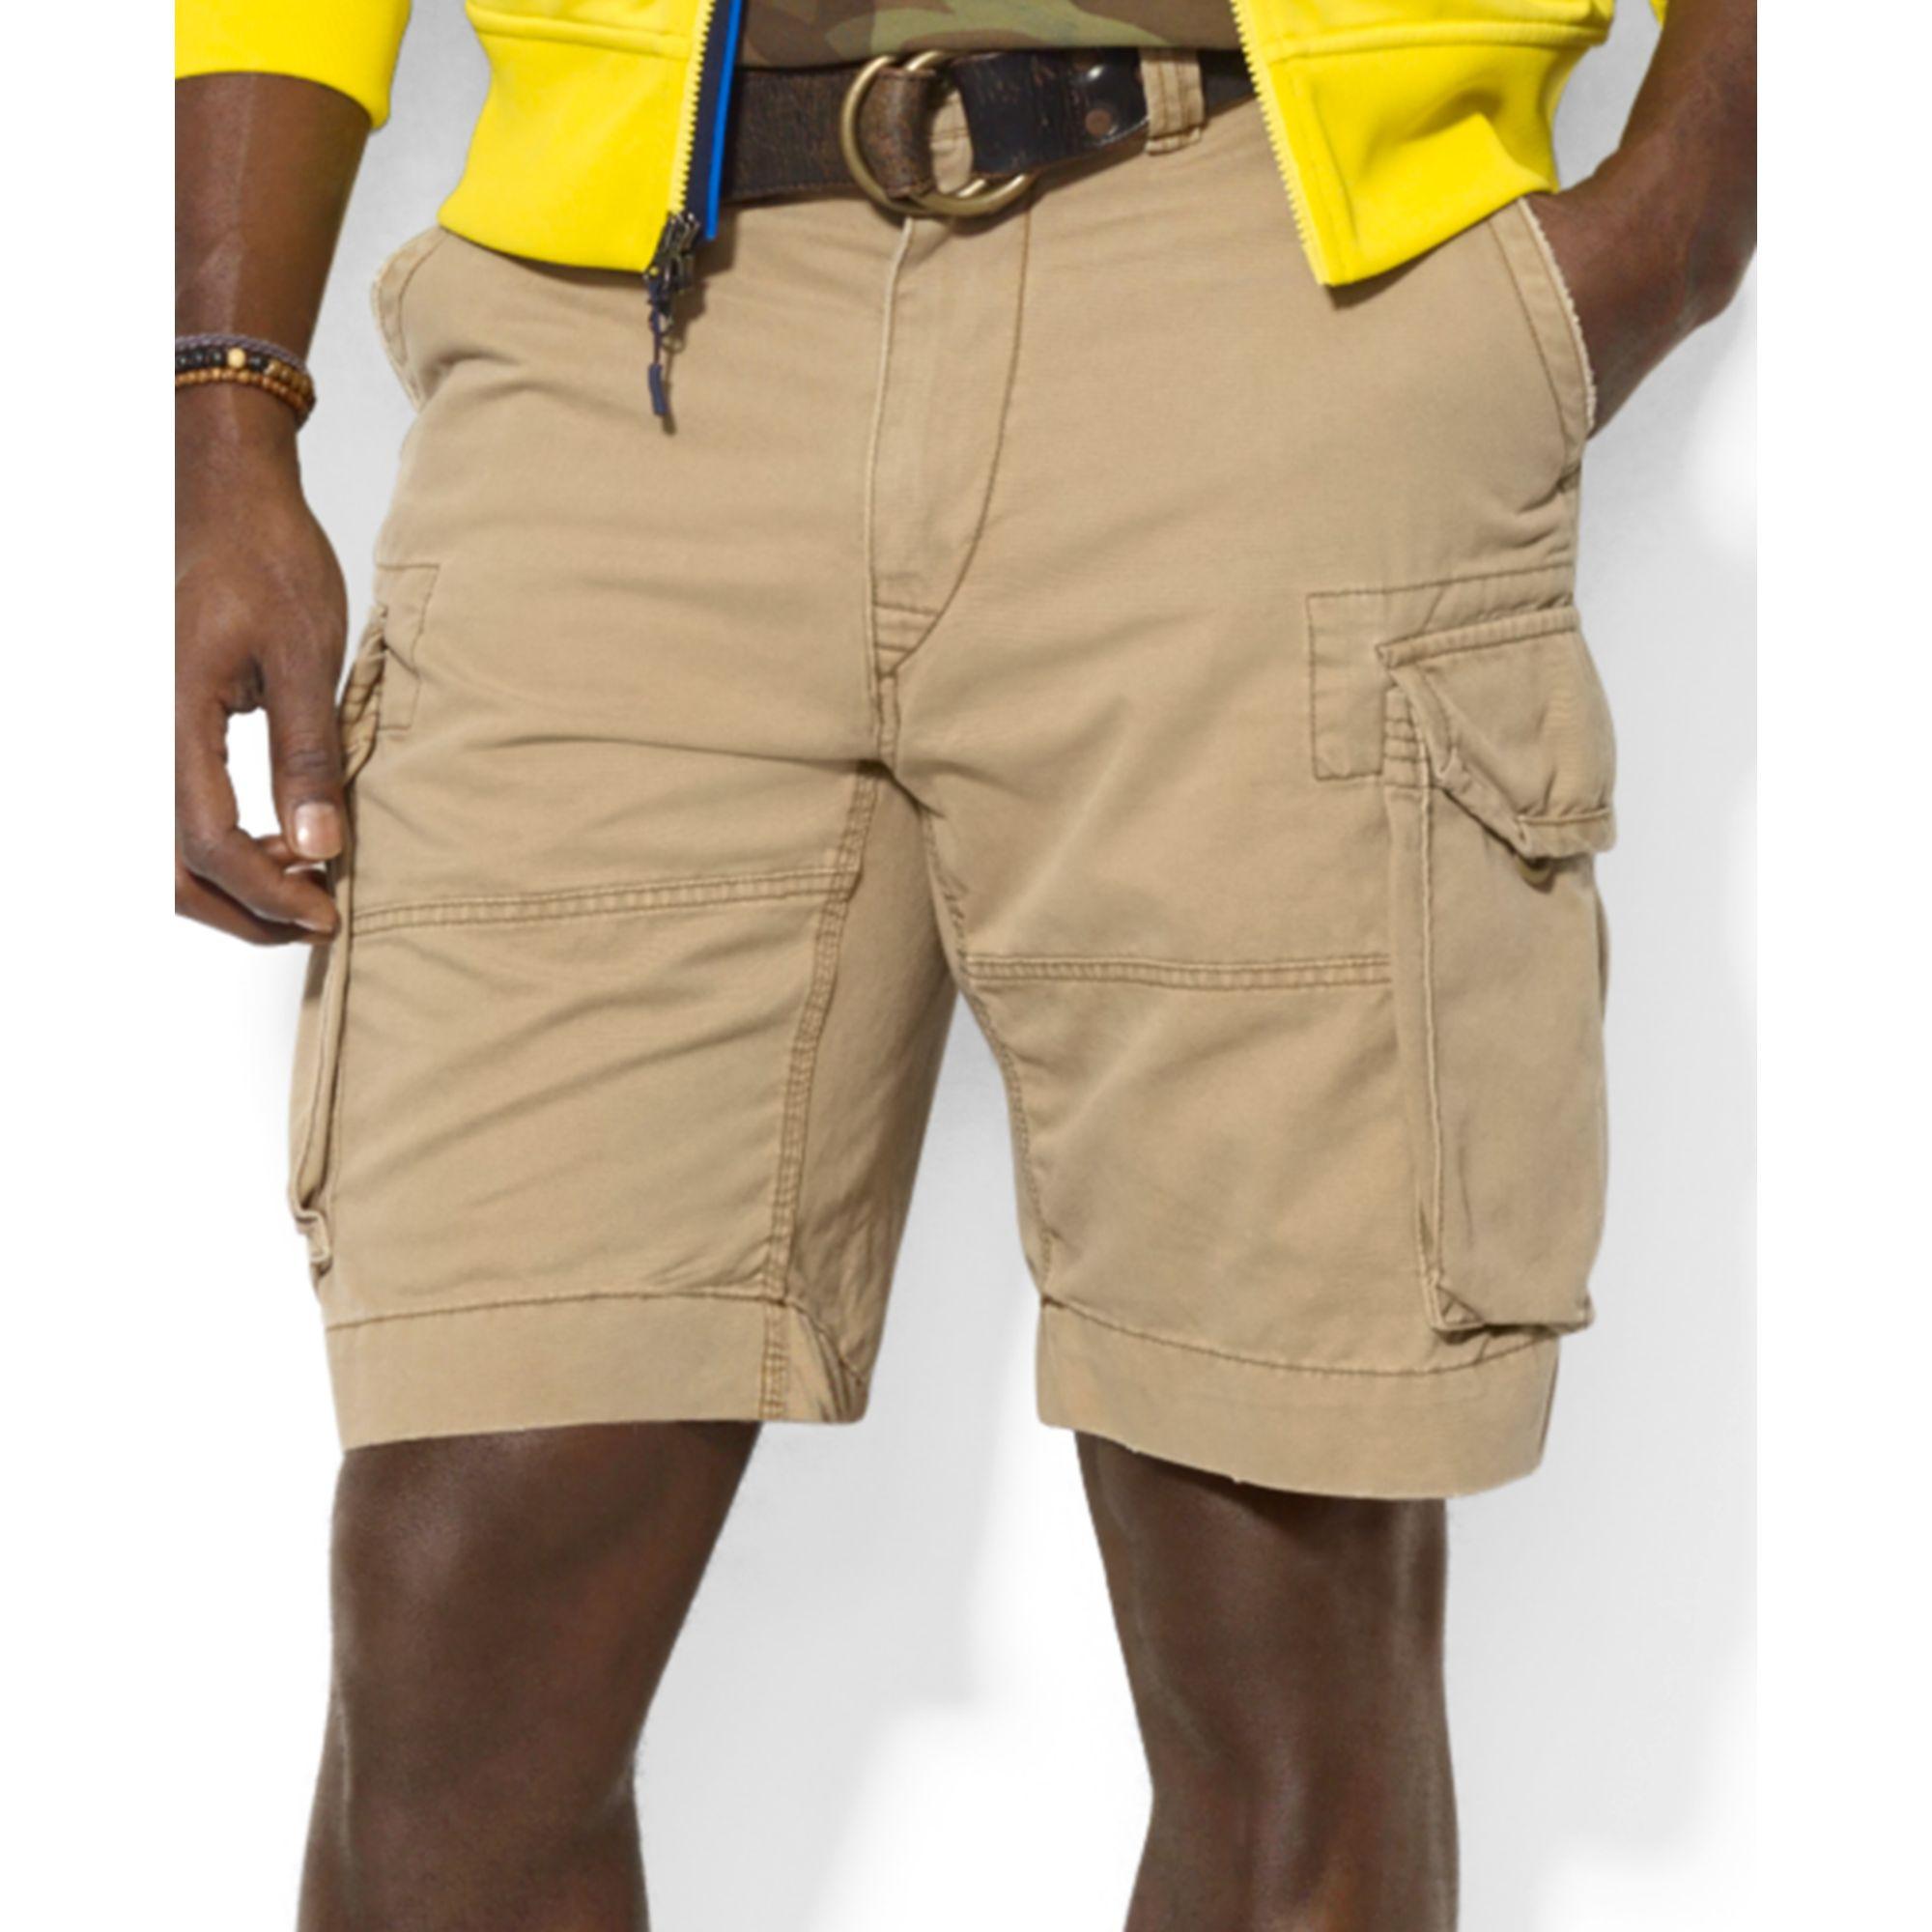 Big Mens Cargo Shorts Hardon Clothes